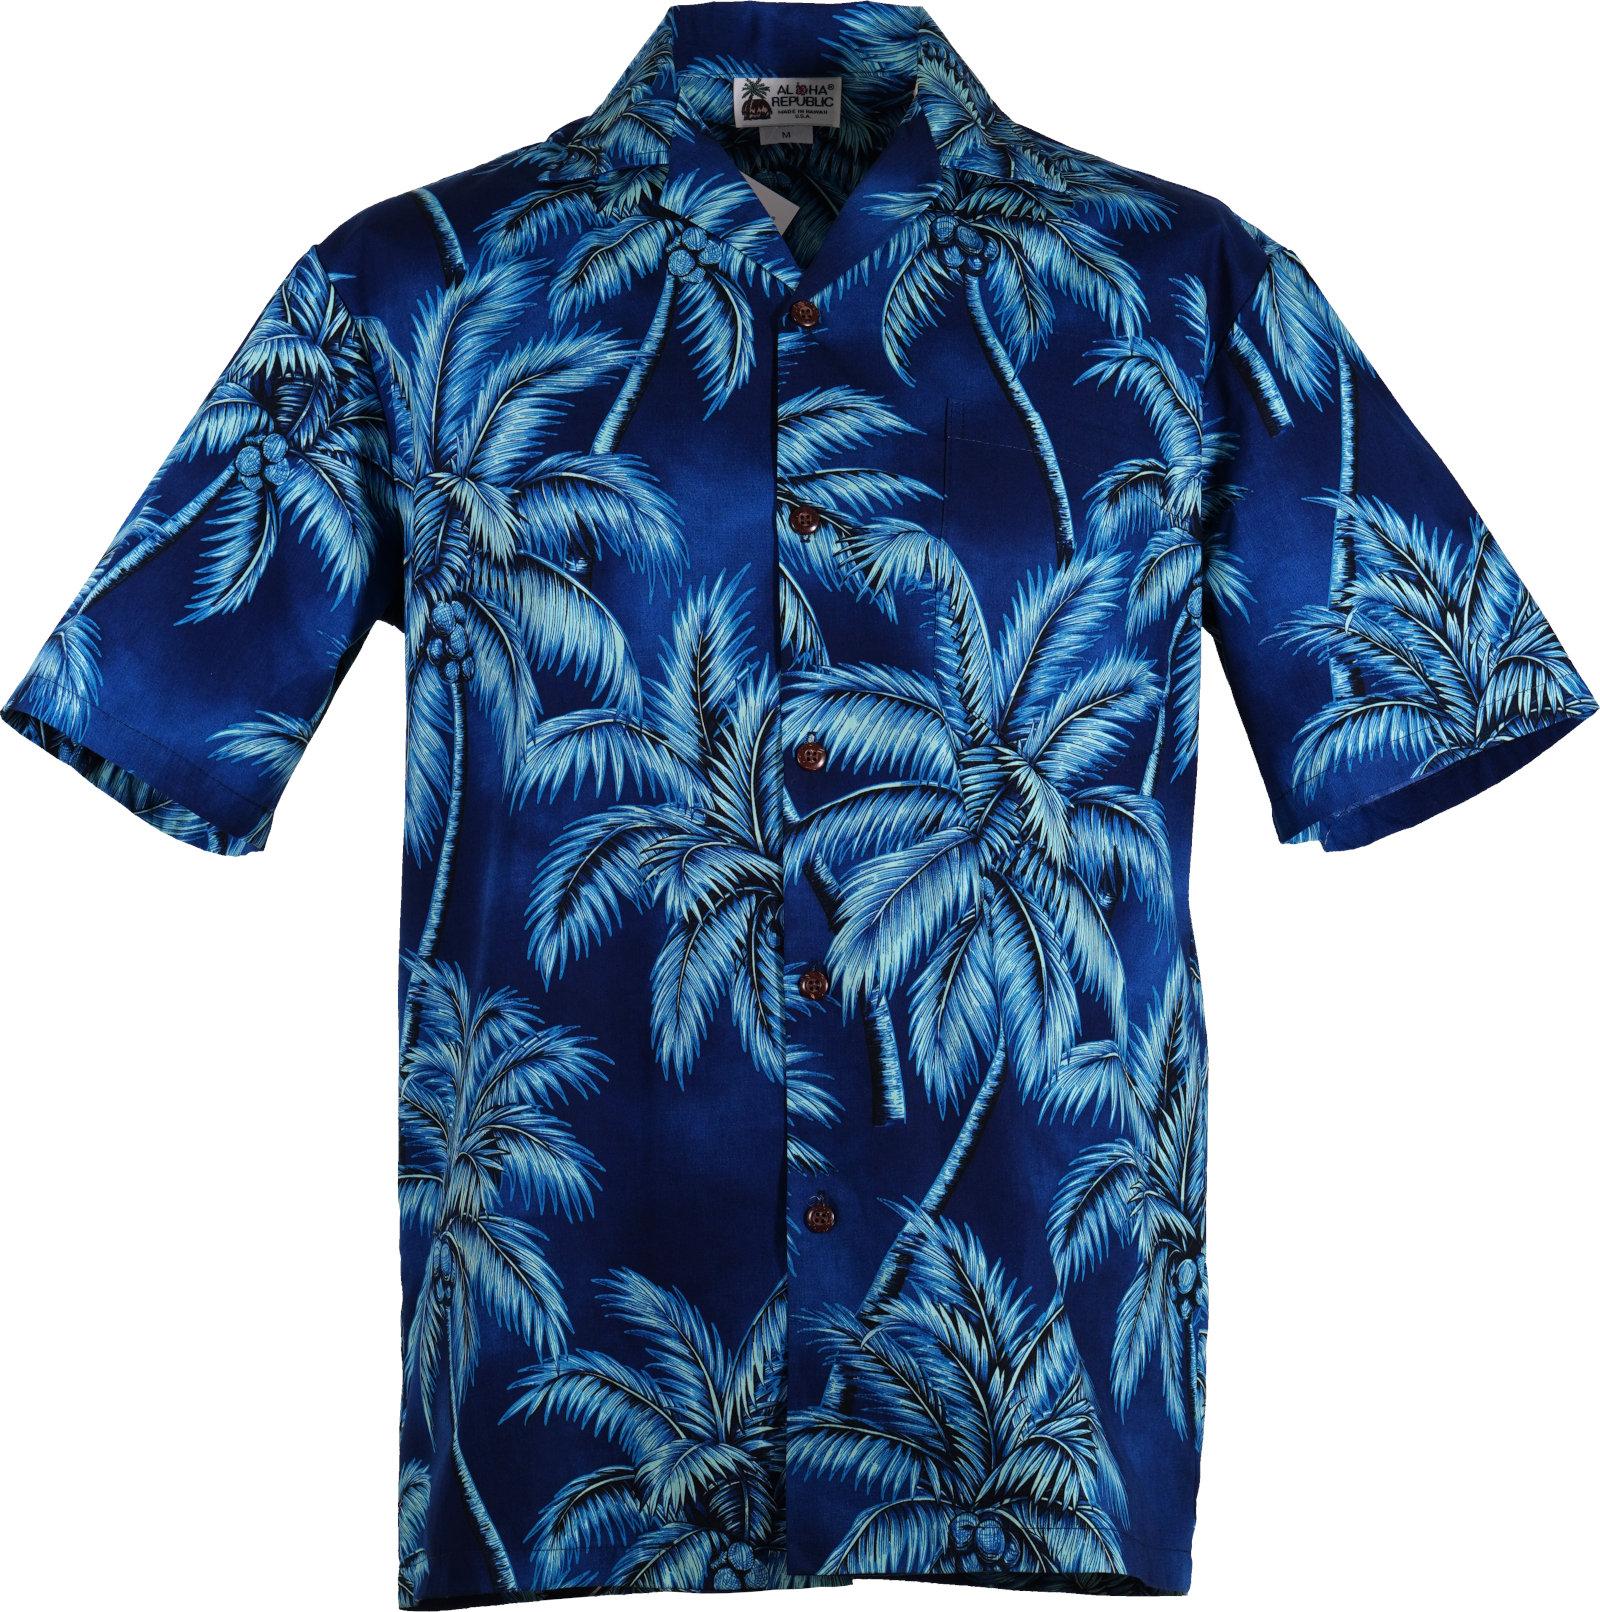 Original Hawaiihemd -Glorious Blue-